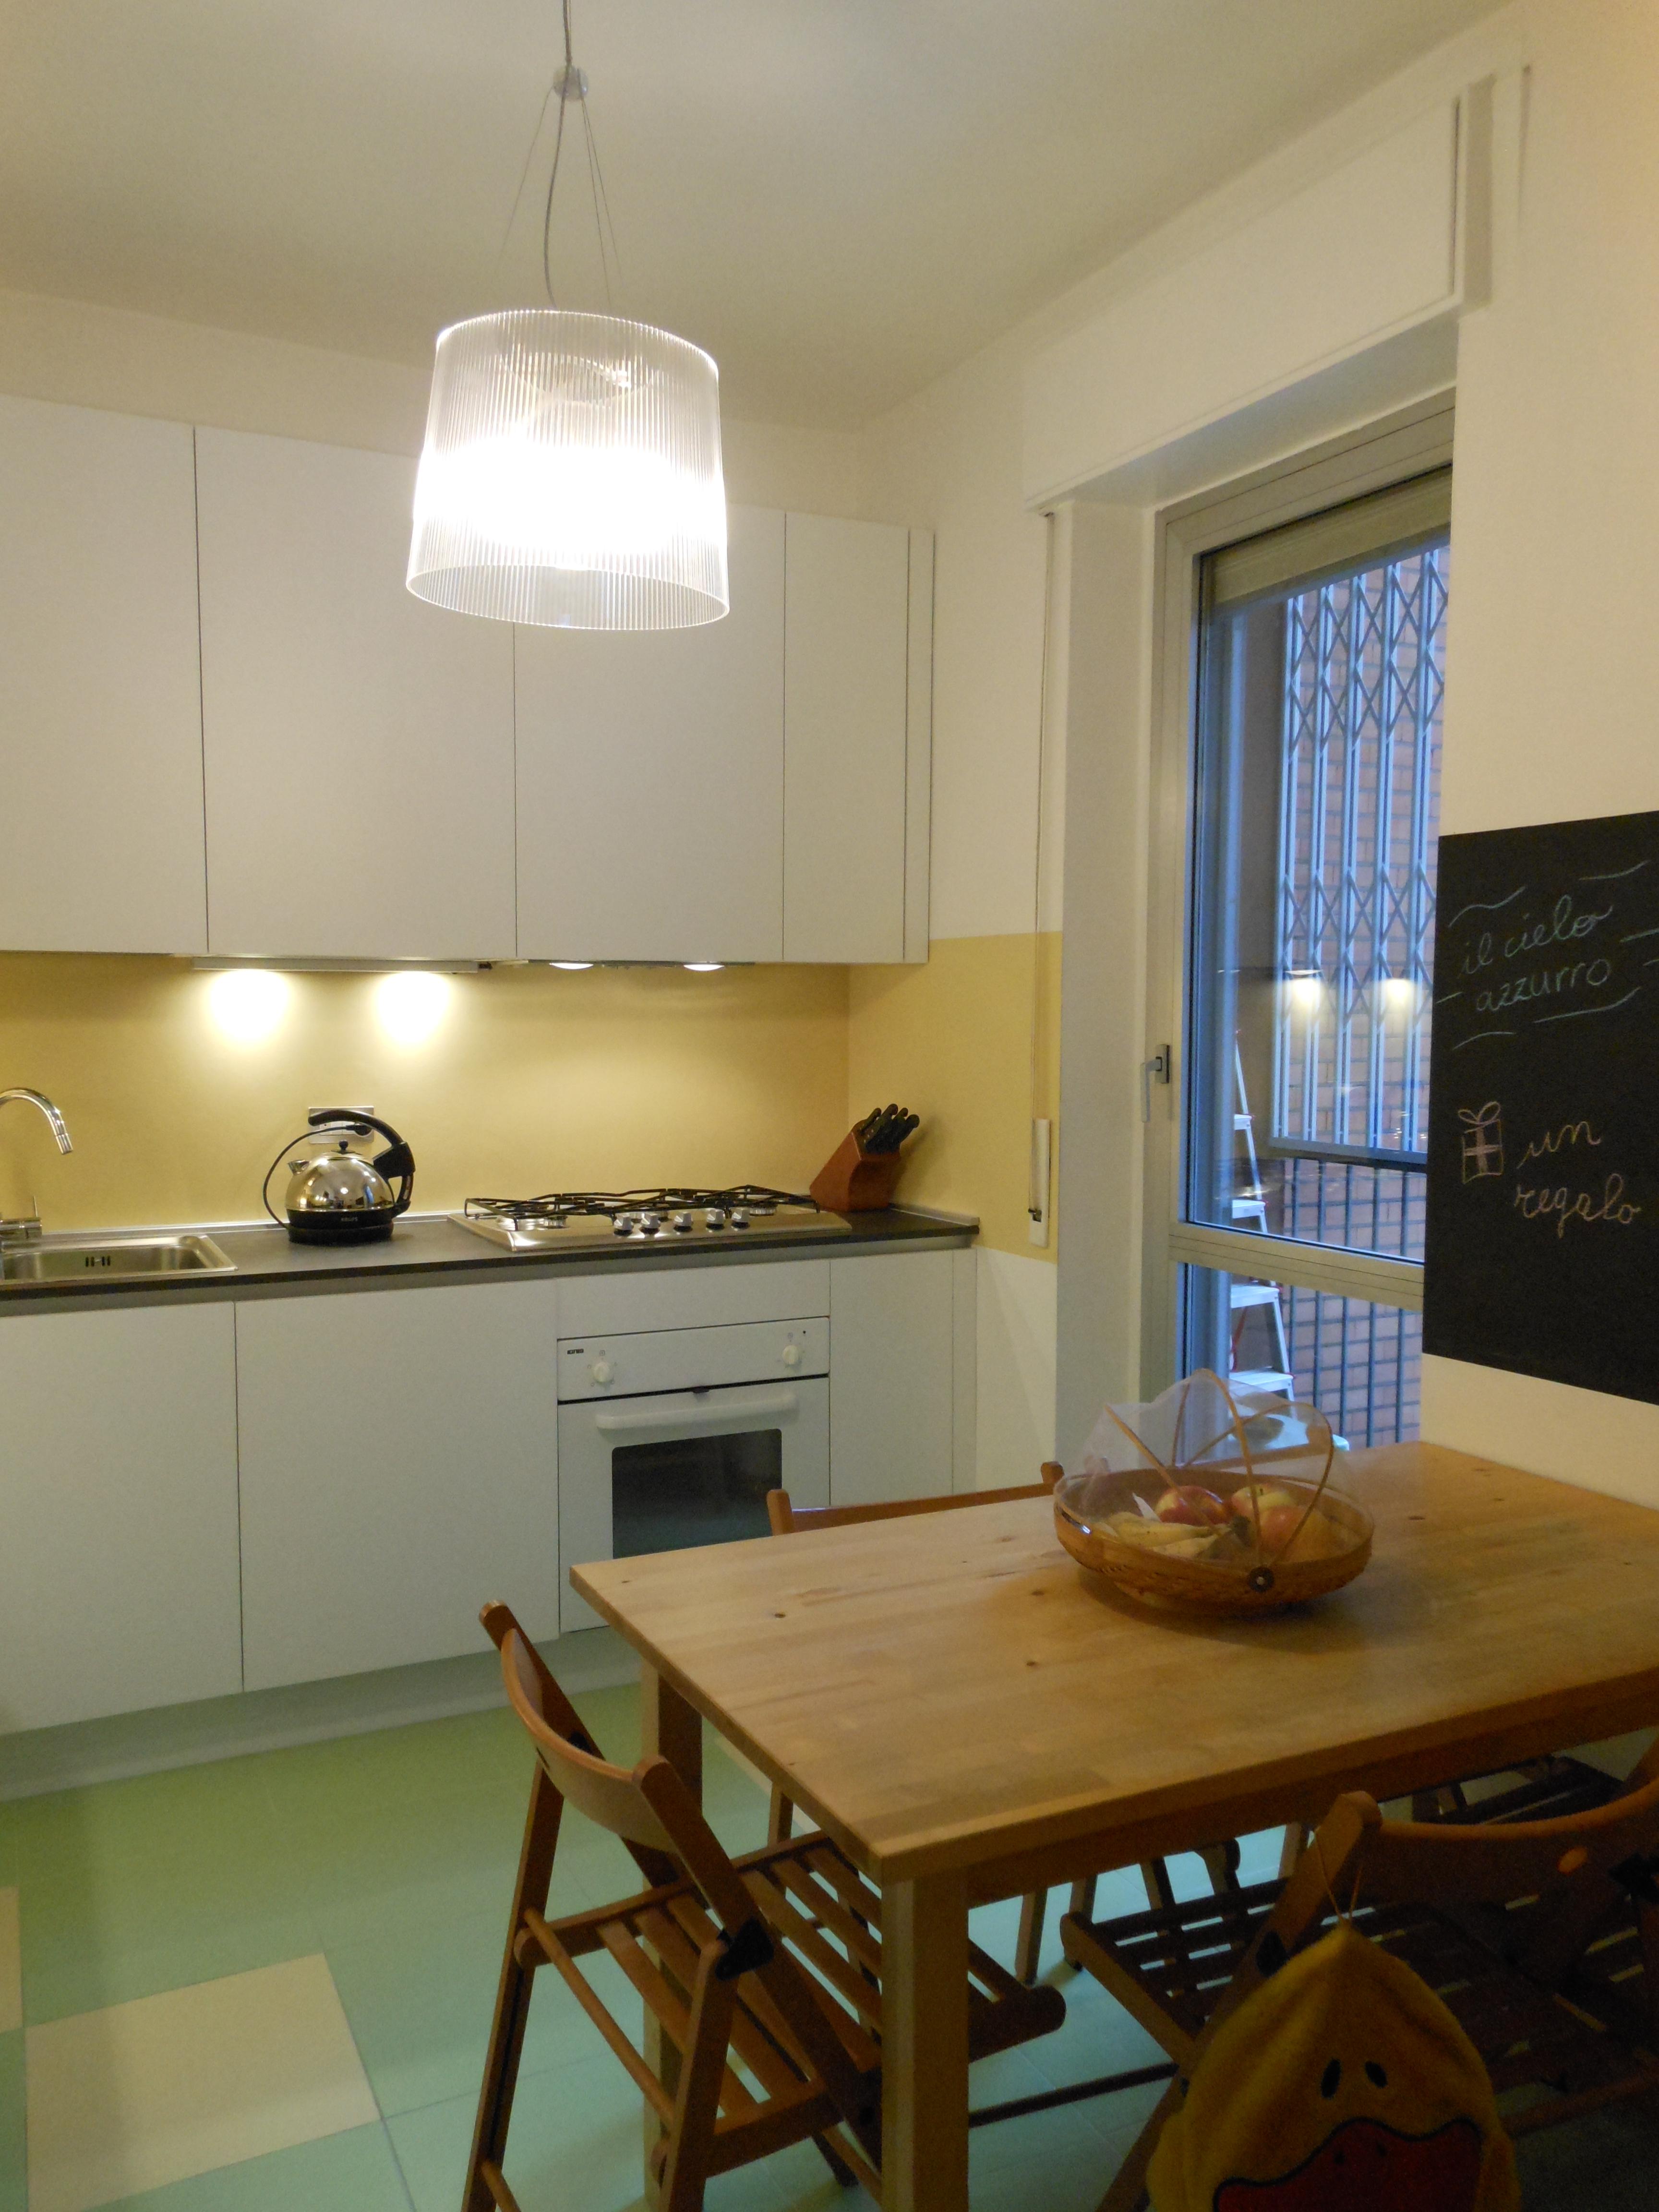 Lavagna paraschizzi cucina frasi sulla lavagna della cucina with lavagna paraschizzi cucina - Lavagna per cucina ...